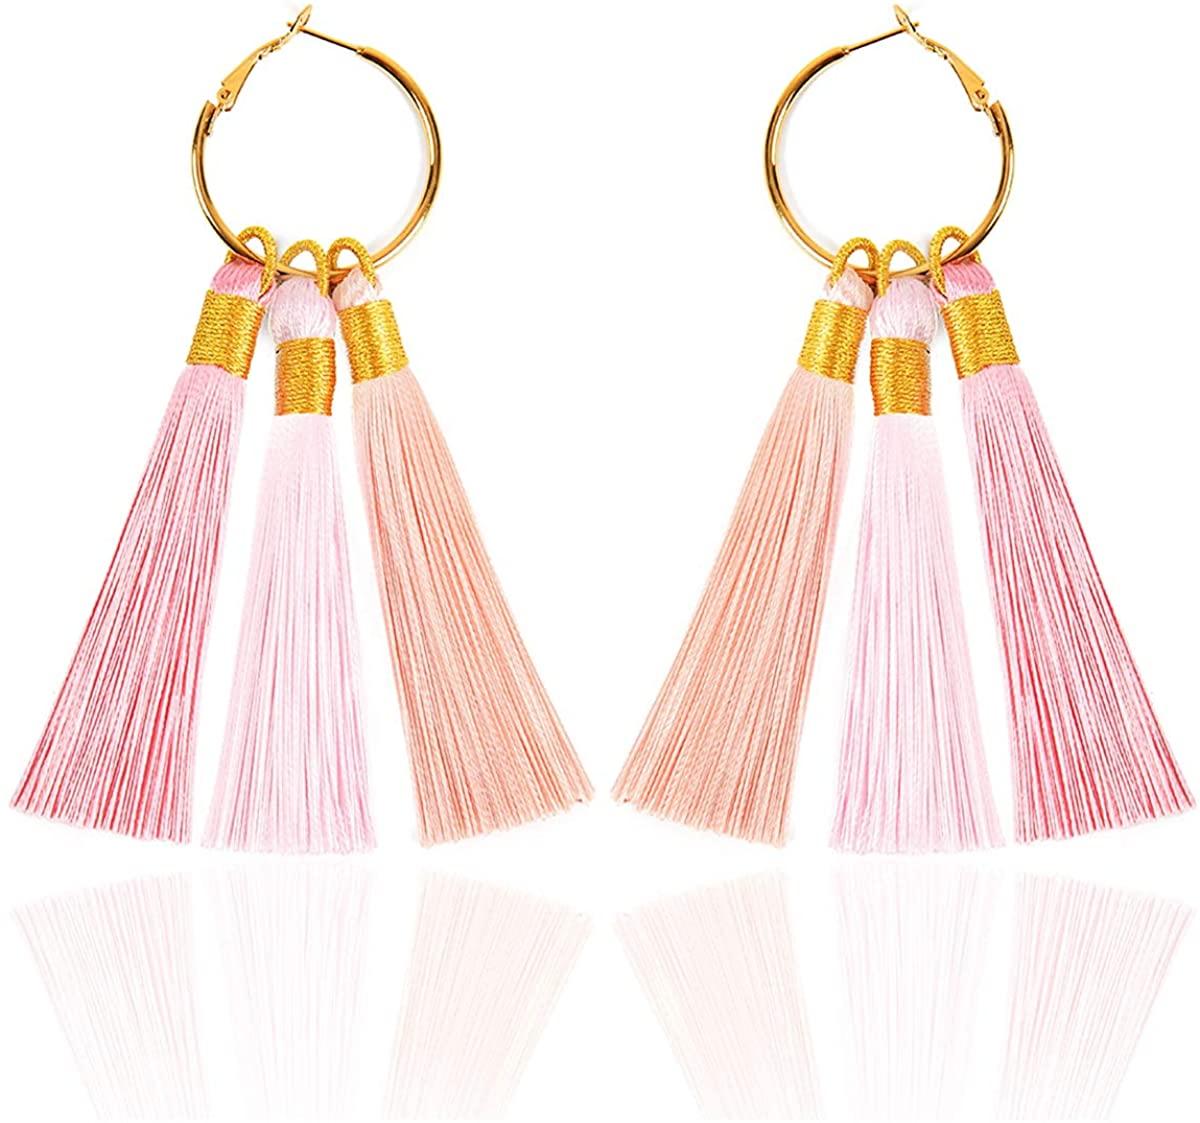 Tassels Dangle Drop Earrings for Women Stainless Steel hoop Handmade Tassel Earrings, Multi Colors